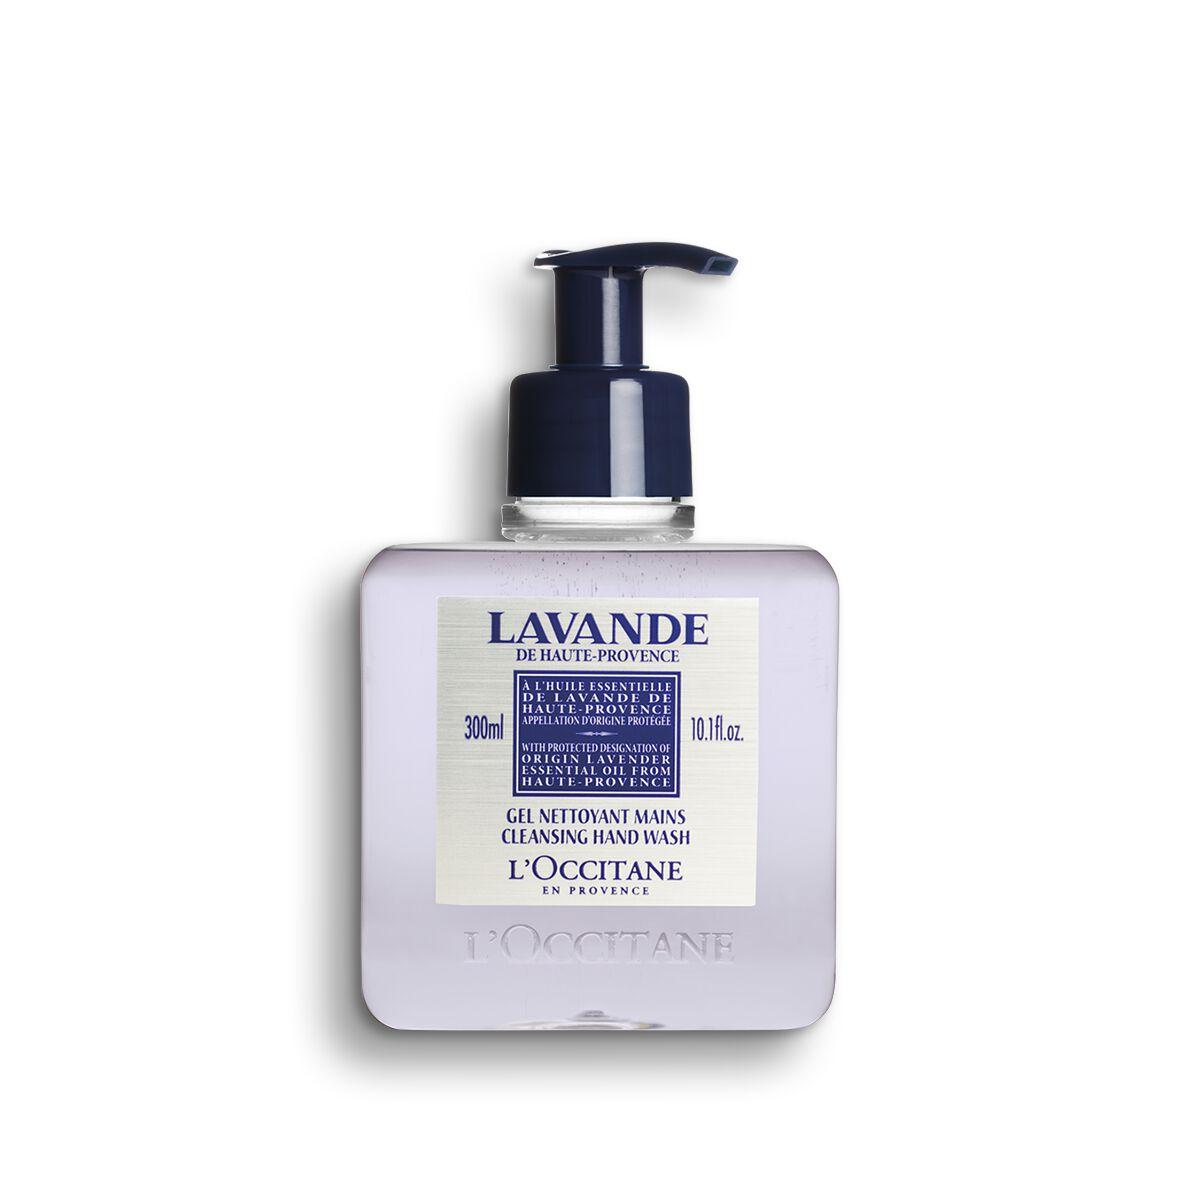 Lavender Cleansing Hand Wash 300 ml. - L'OCCITANE